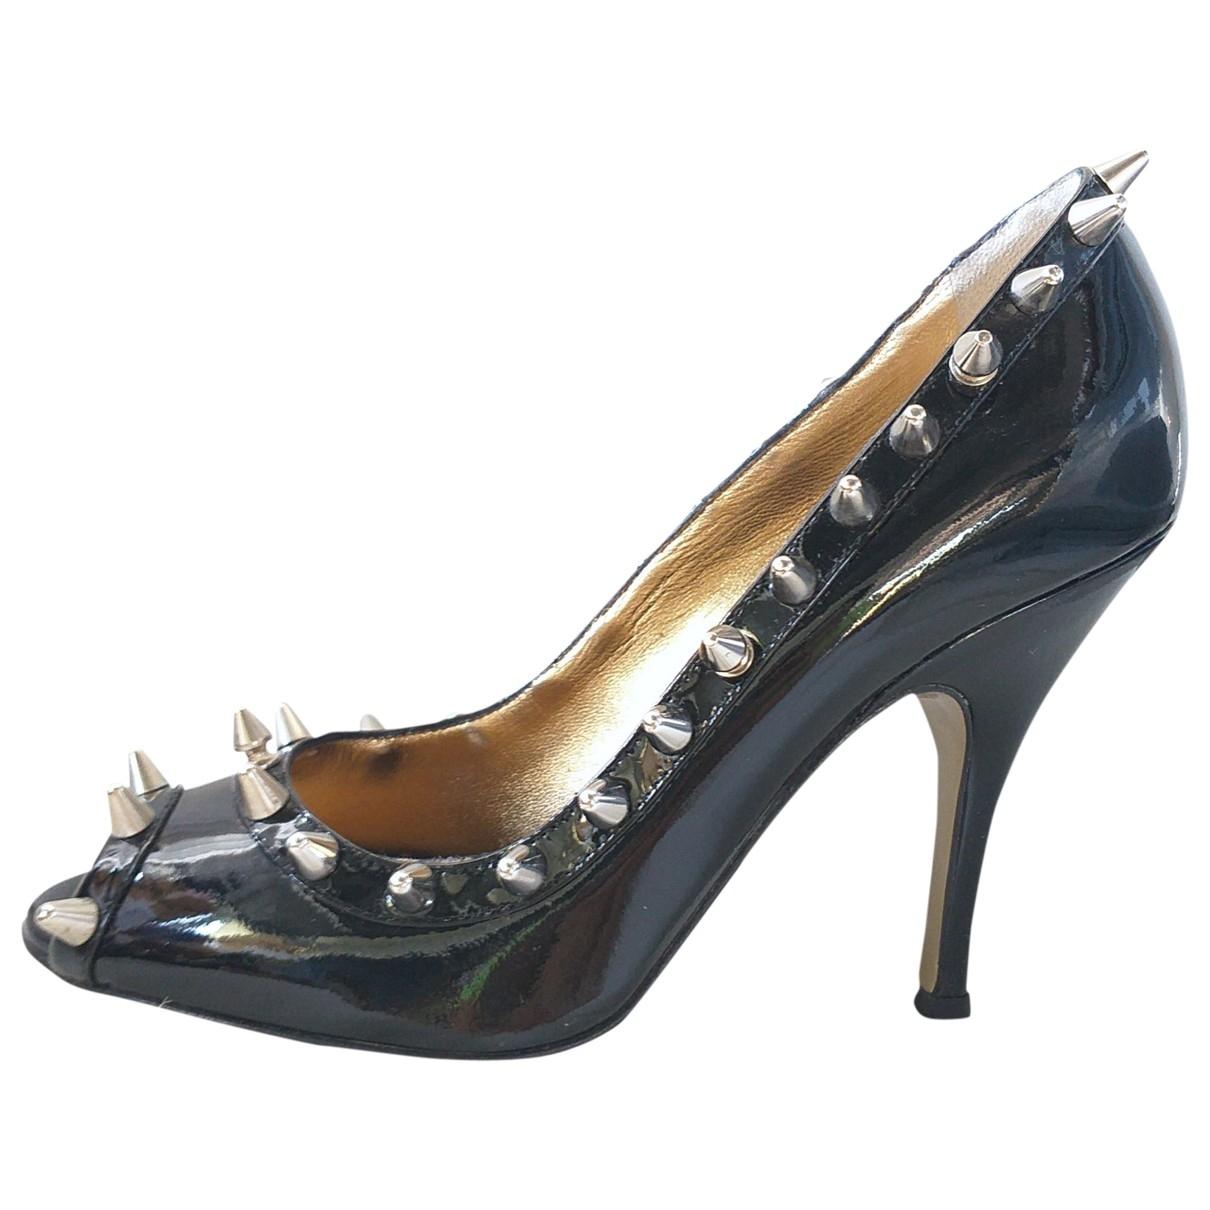 D&g \N Black Patent leather Heels for Women 38 EU